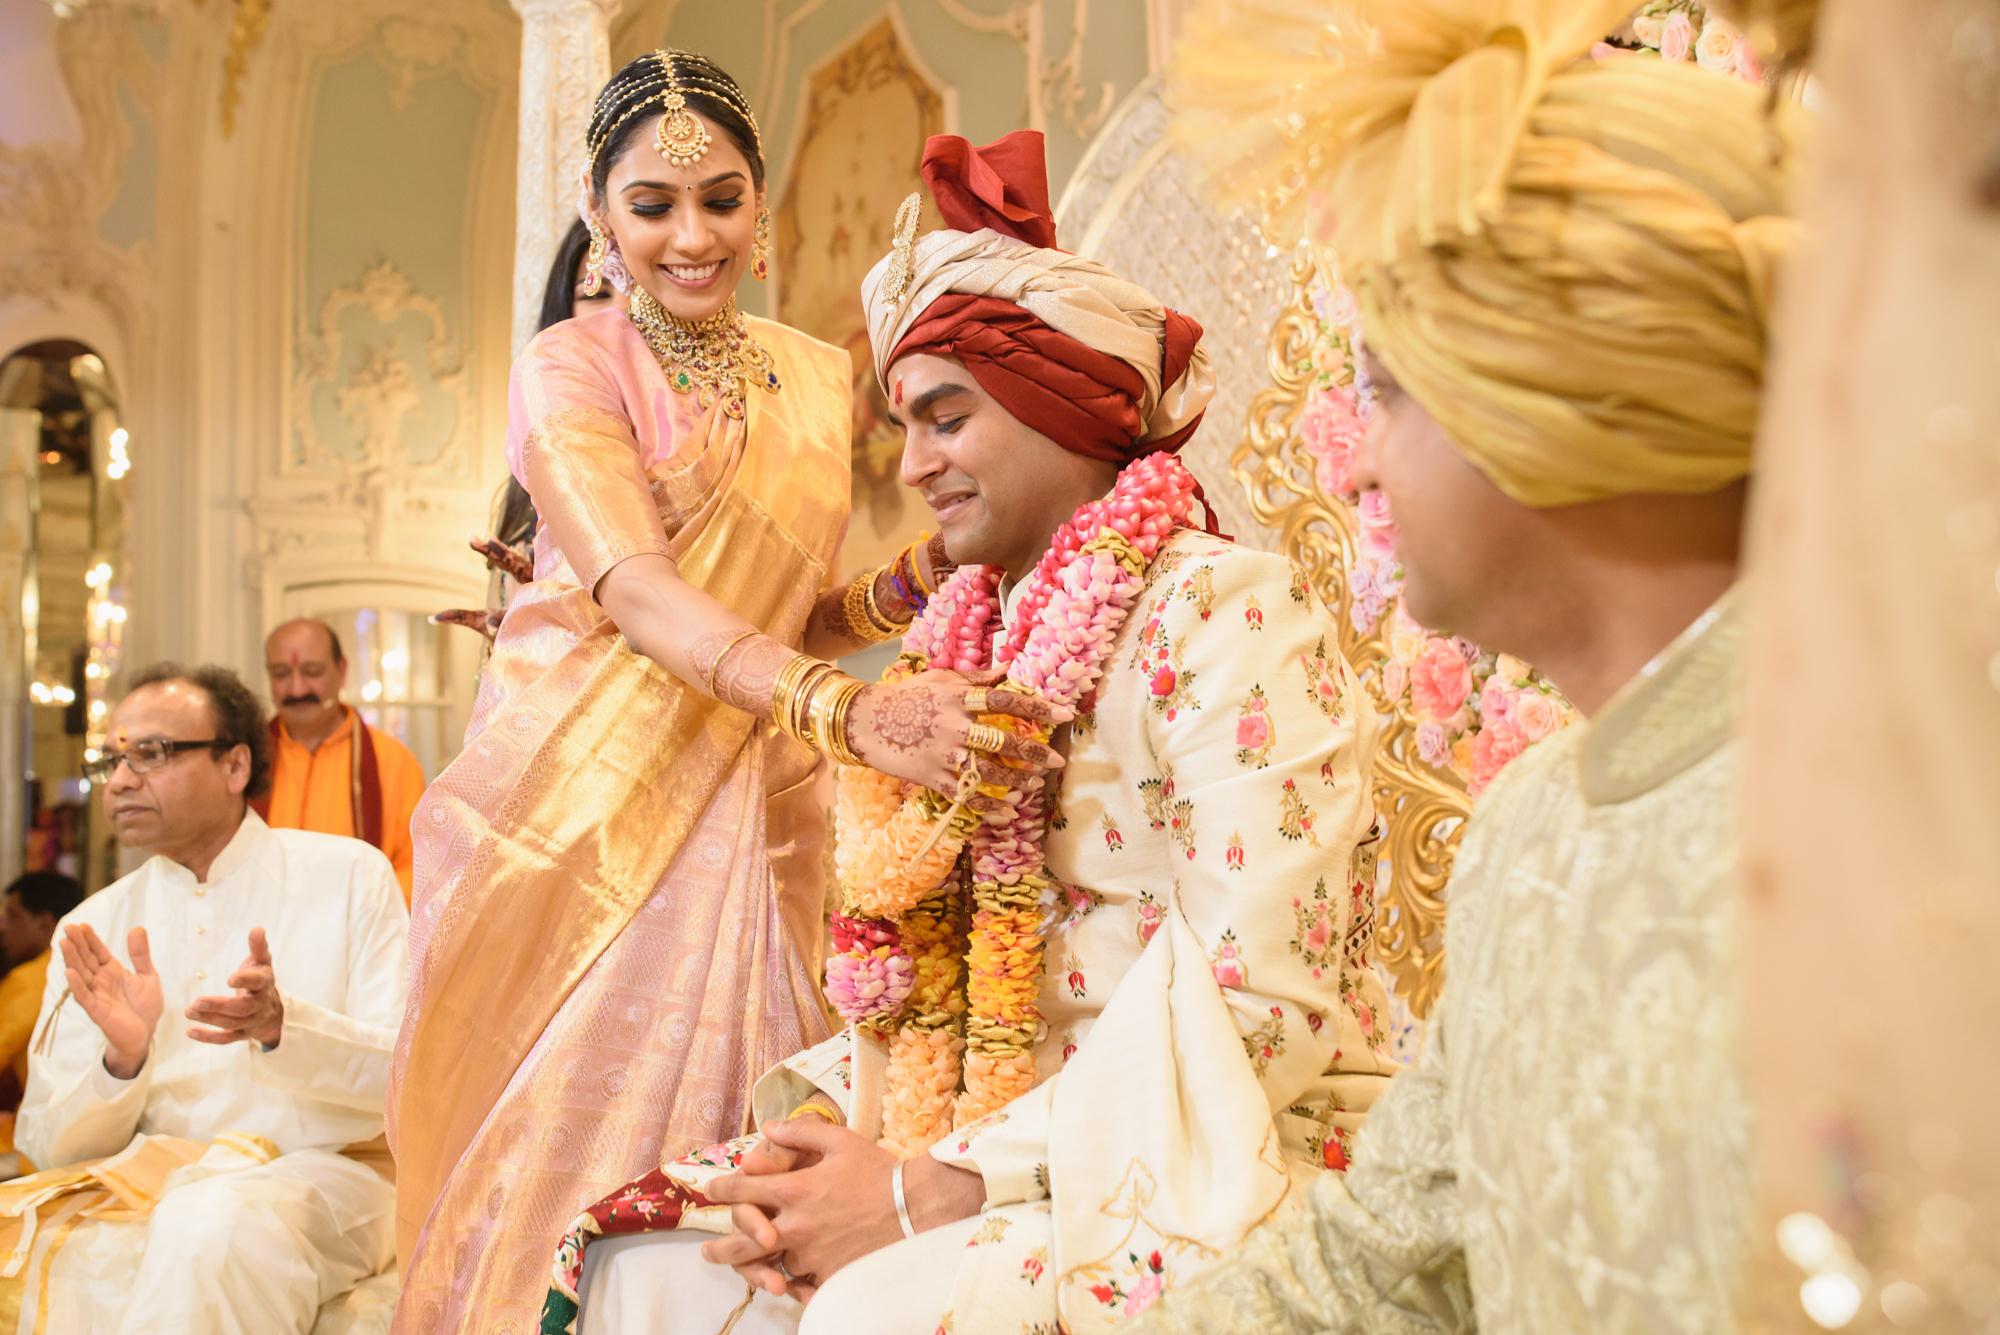 Tamil Gujrati hindu wedding photography photographer london the savoy -55.jpg